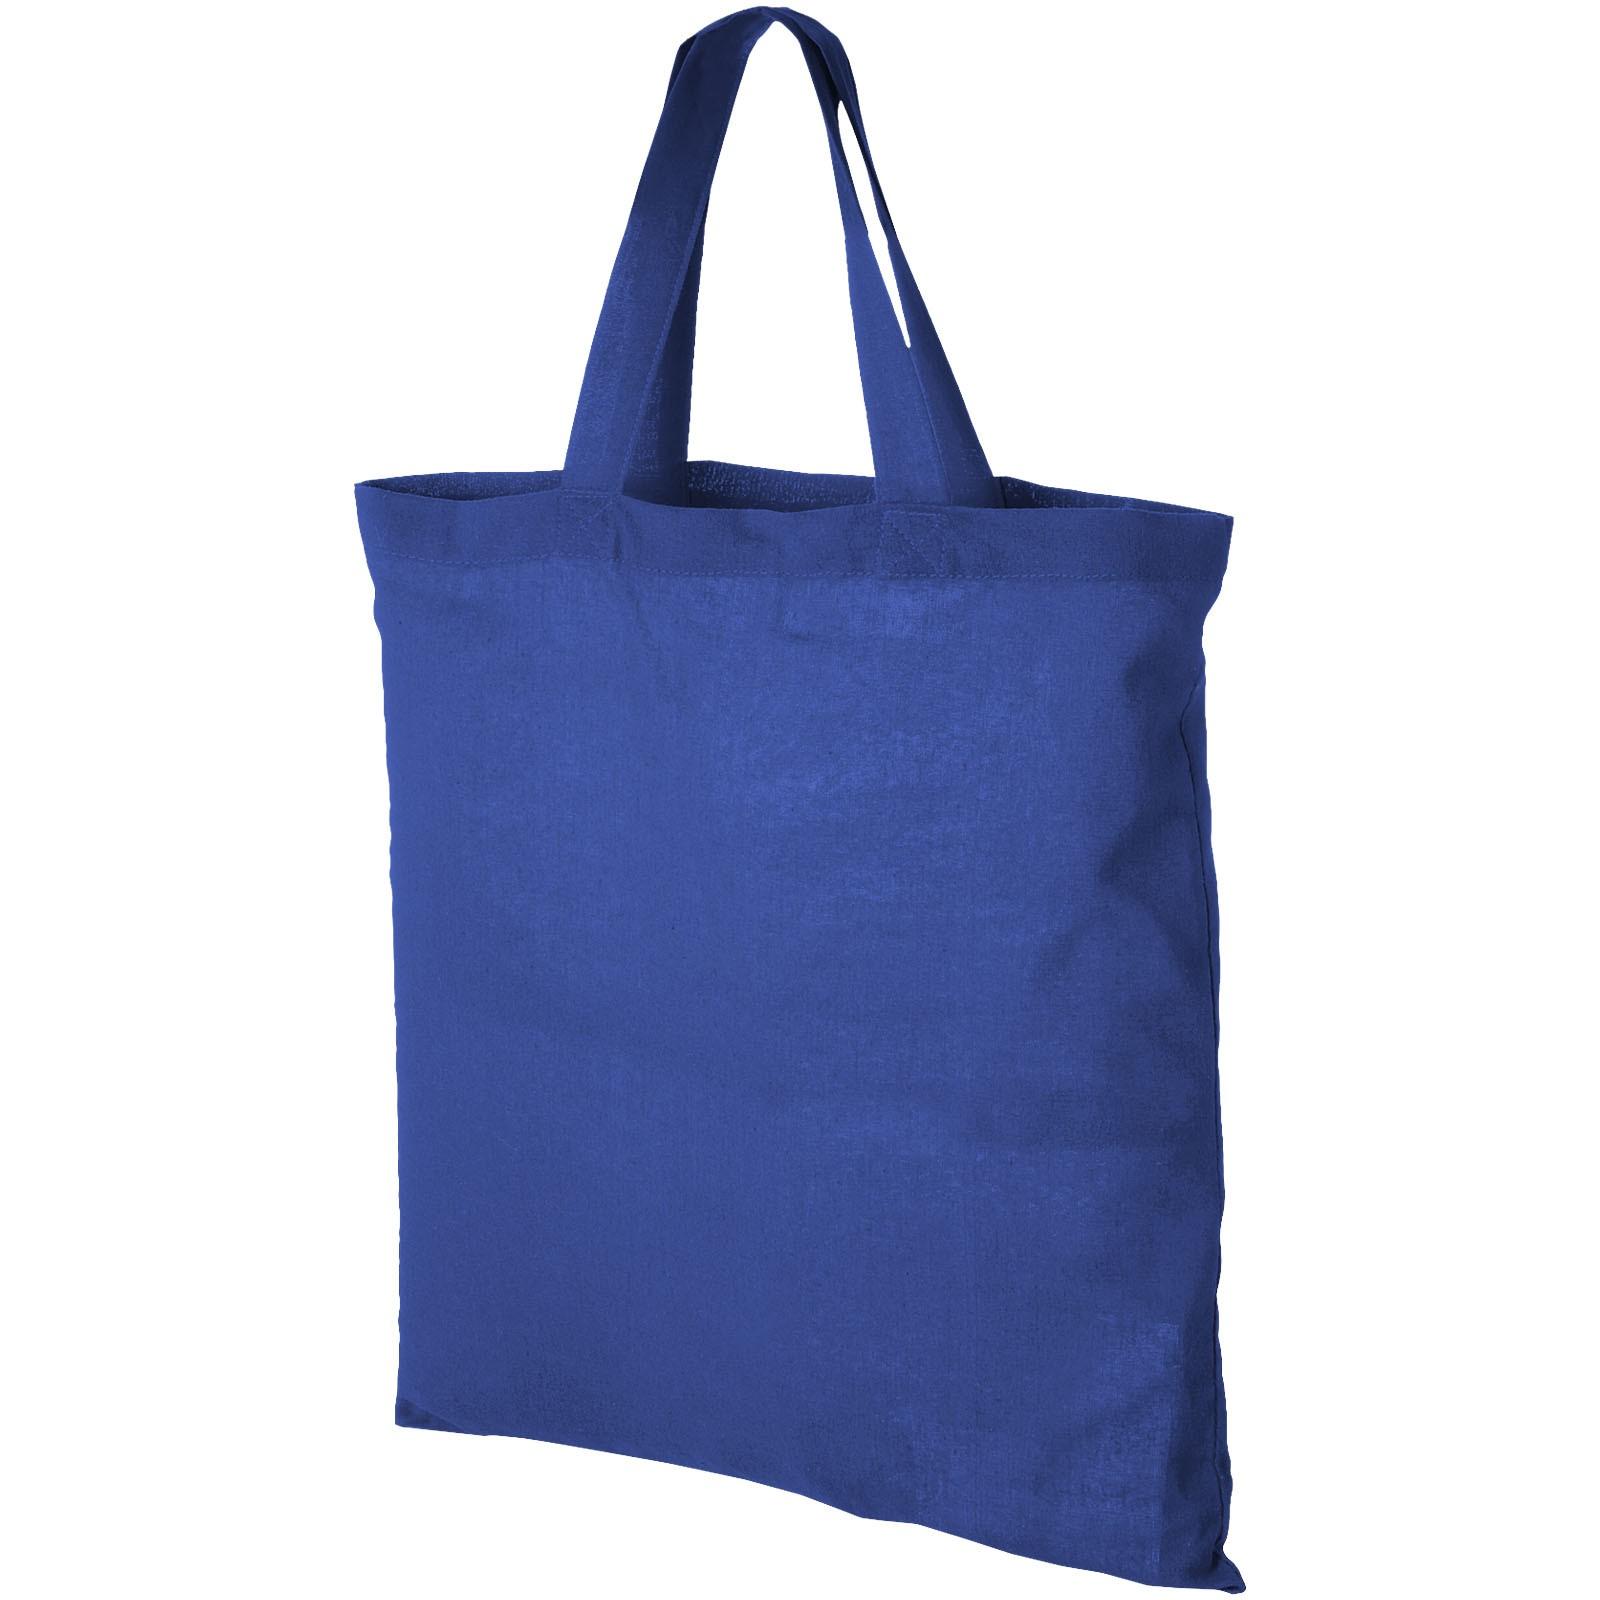 Virginia 100 g/m² cotton tote bag short handles - Royal blue